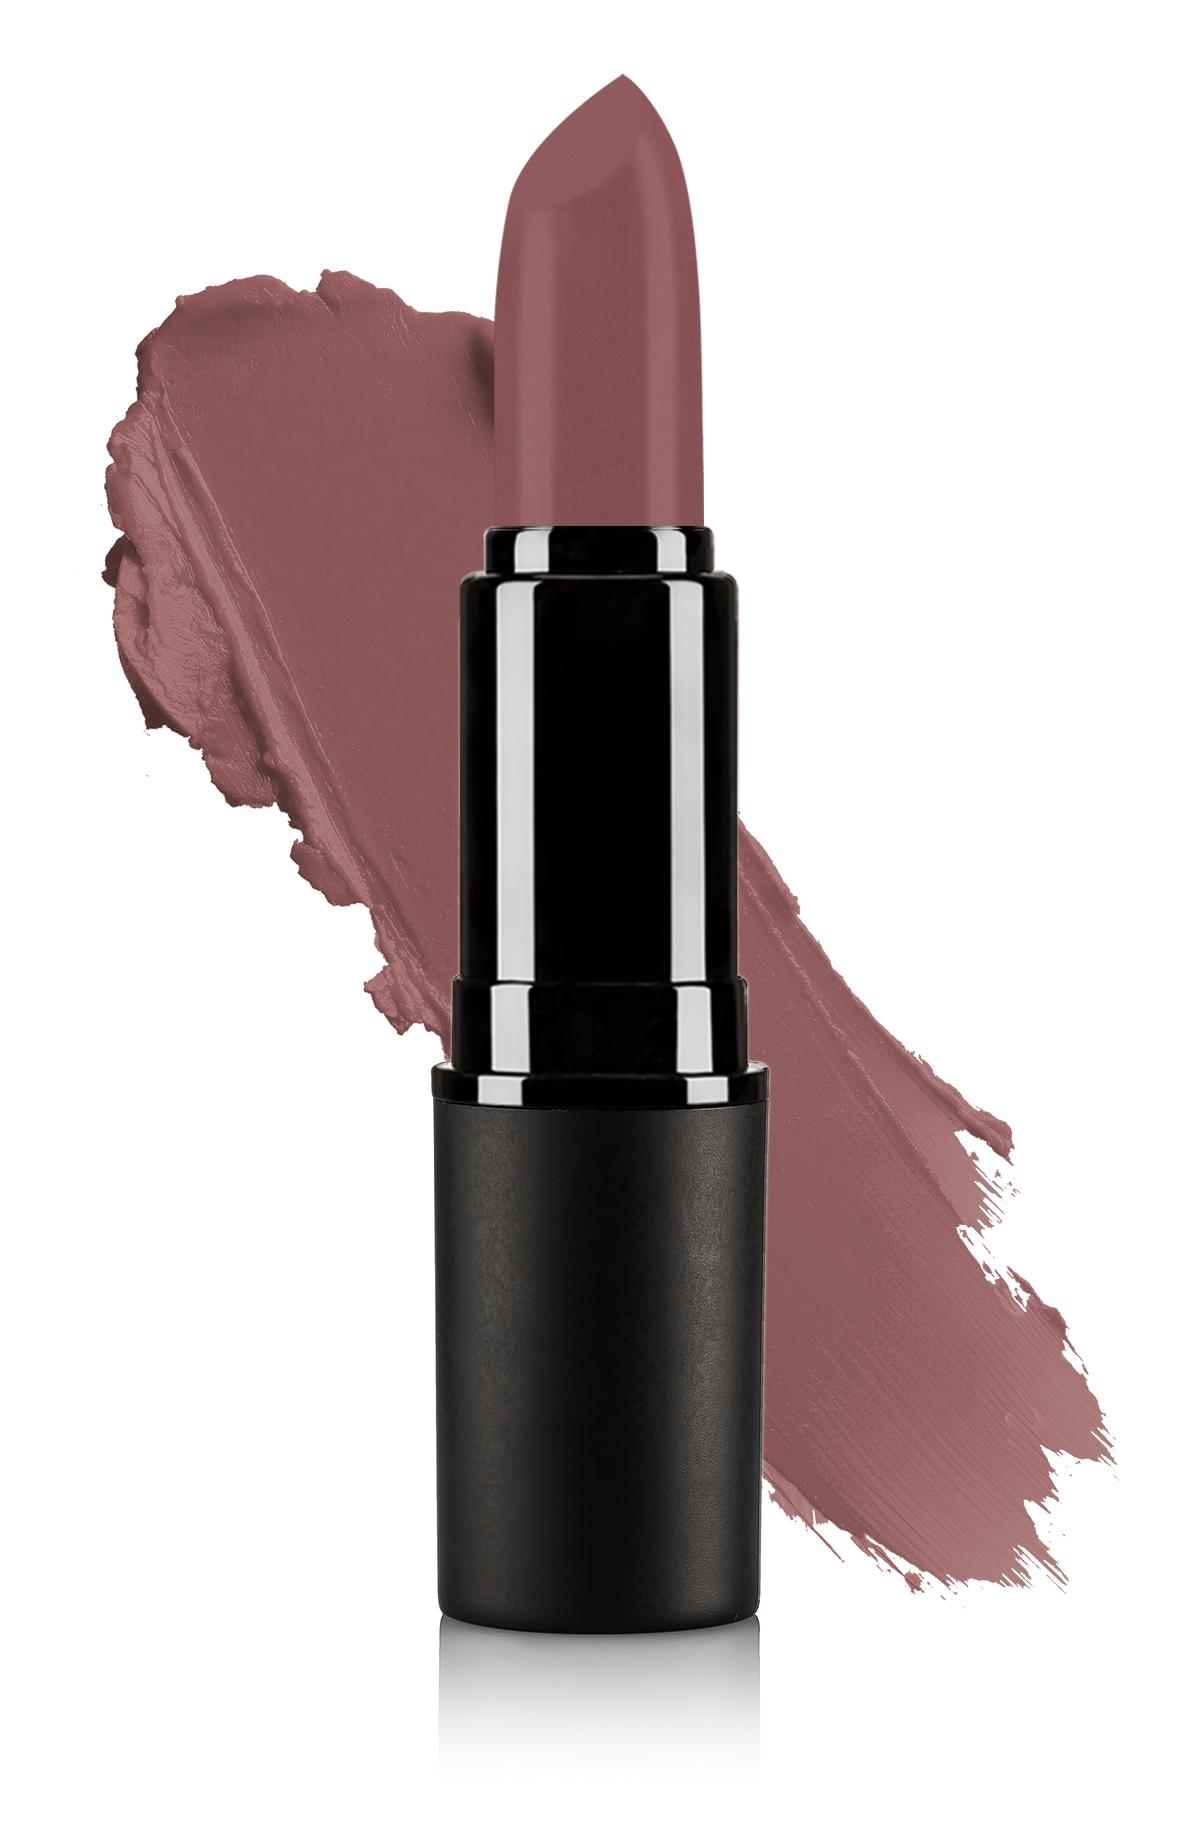 Matte Lipstick - 174 -Ruj - Lipstick Thumbnail